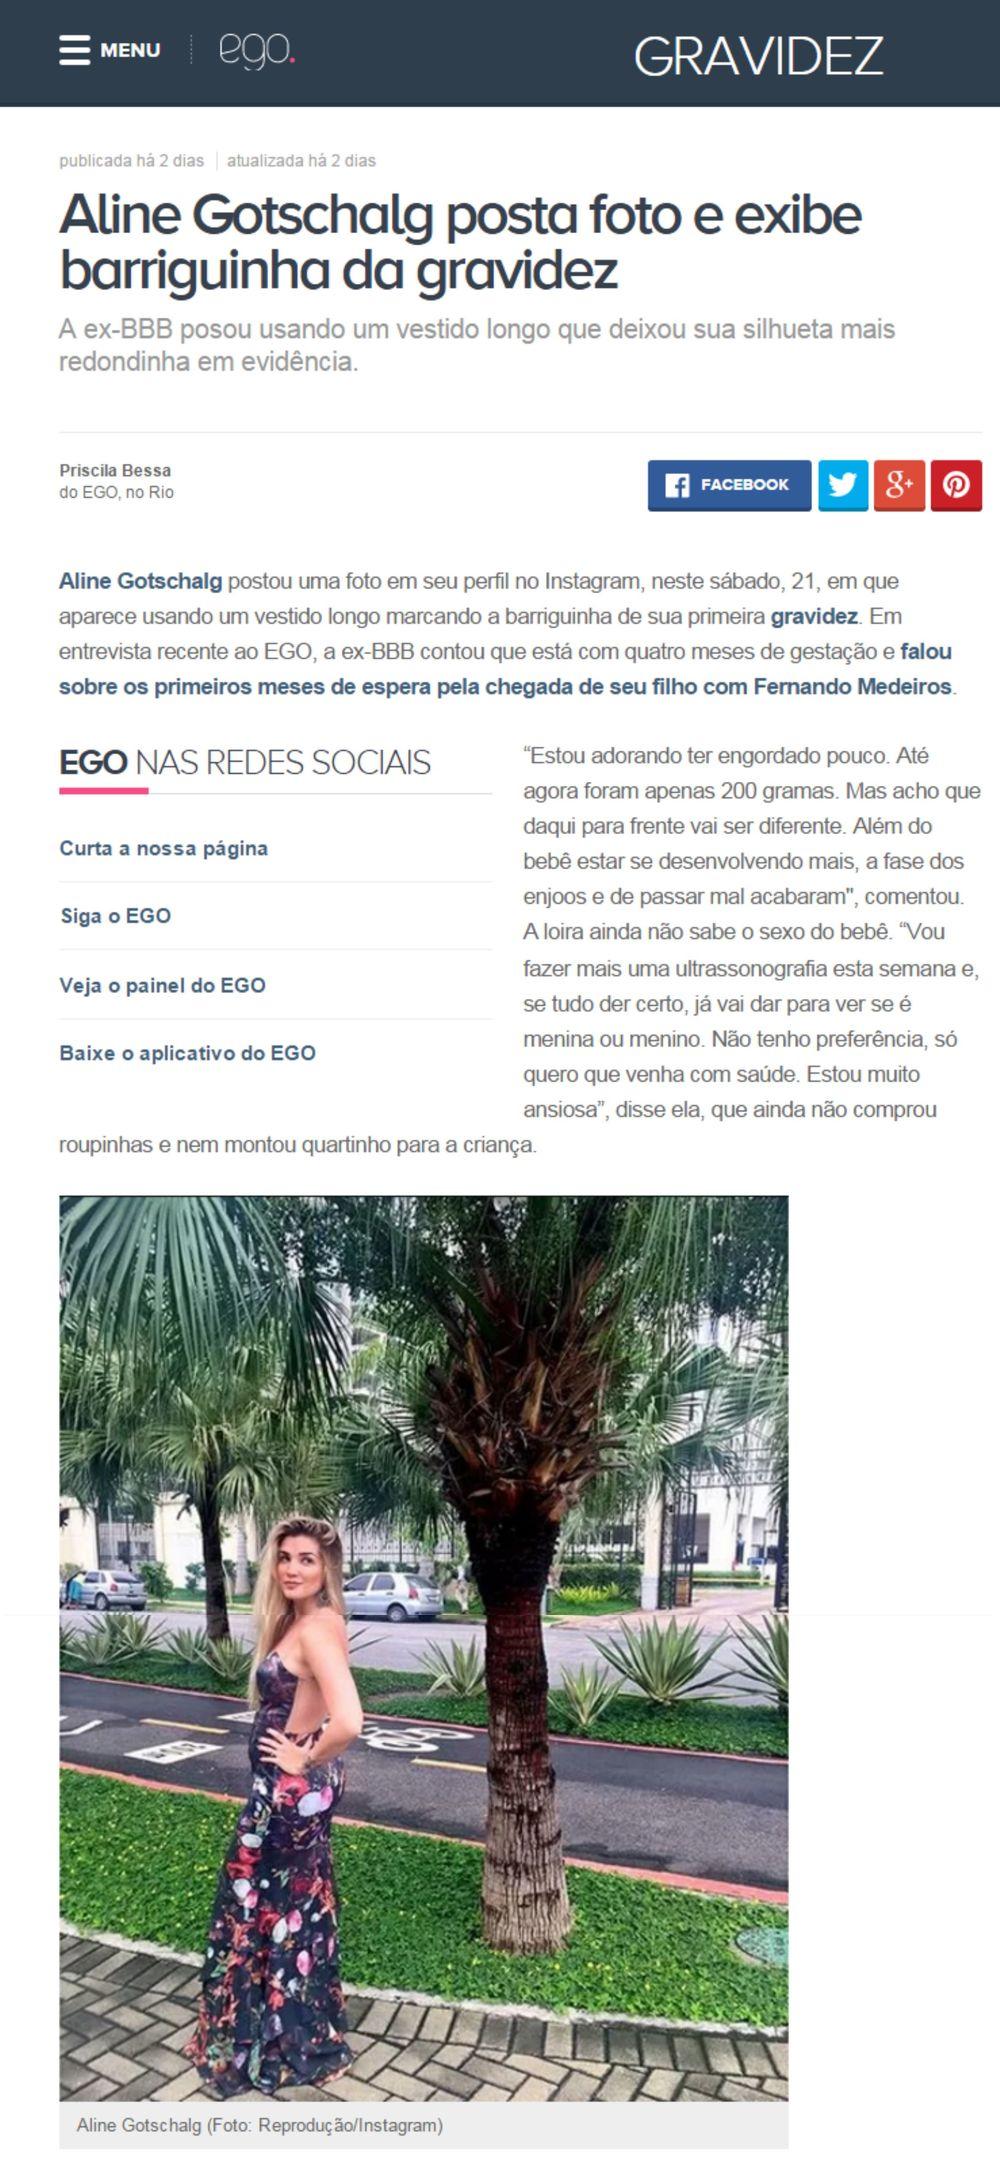 Cajo - Site Ego - 21-11-2015.jpg